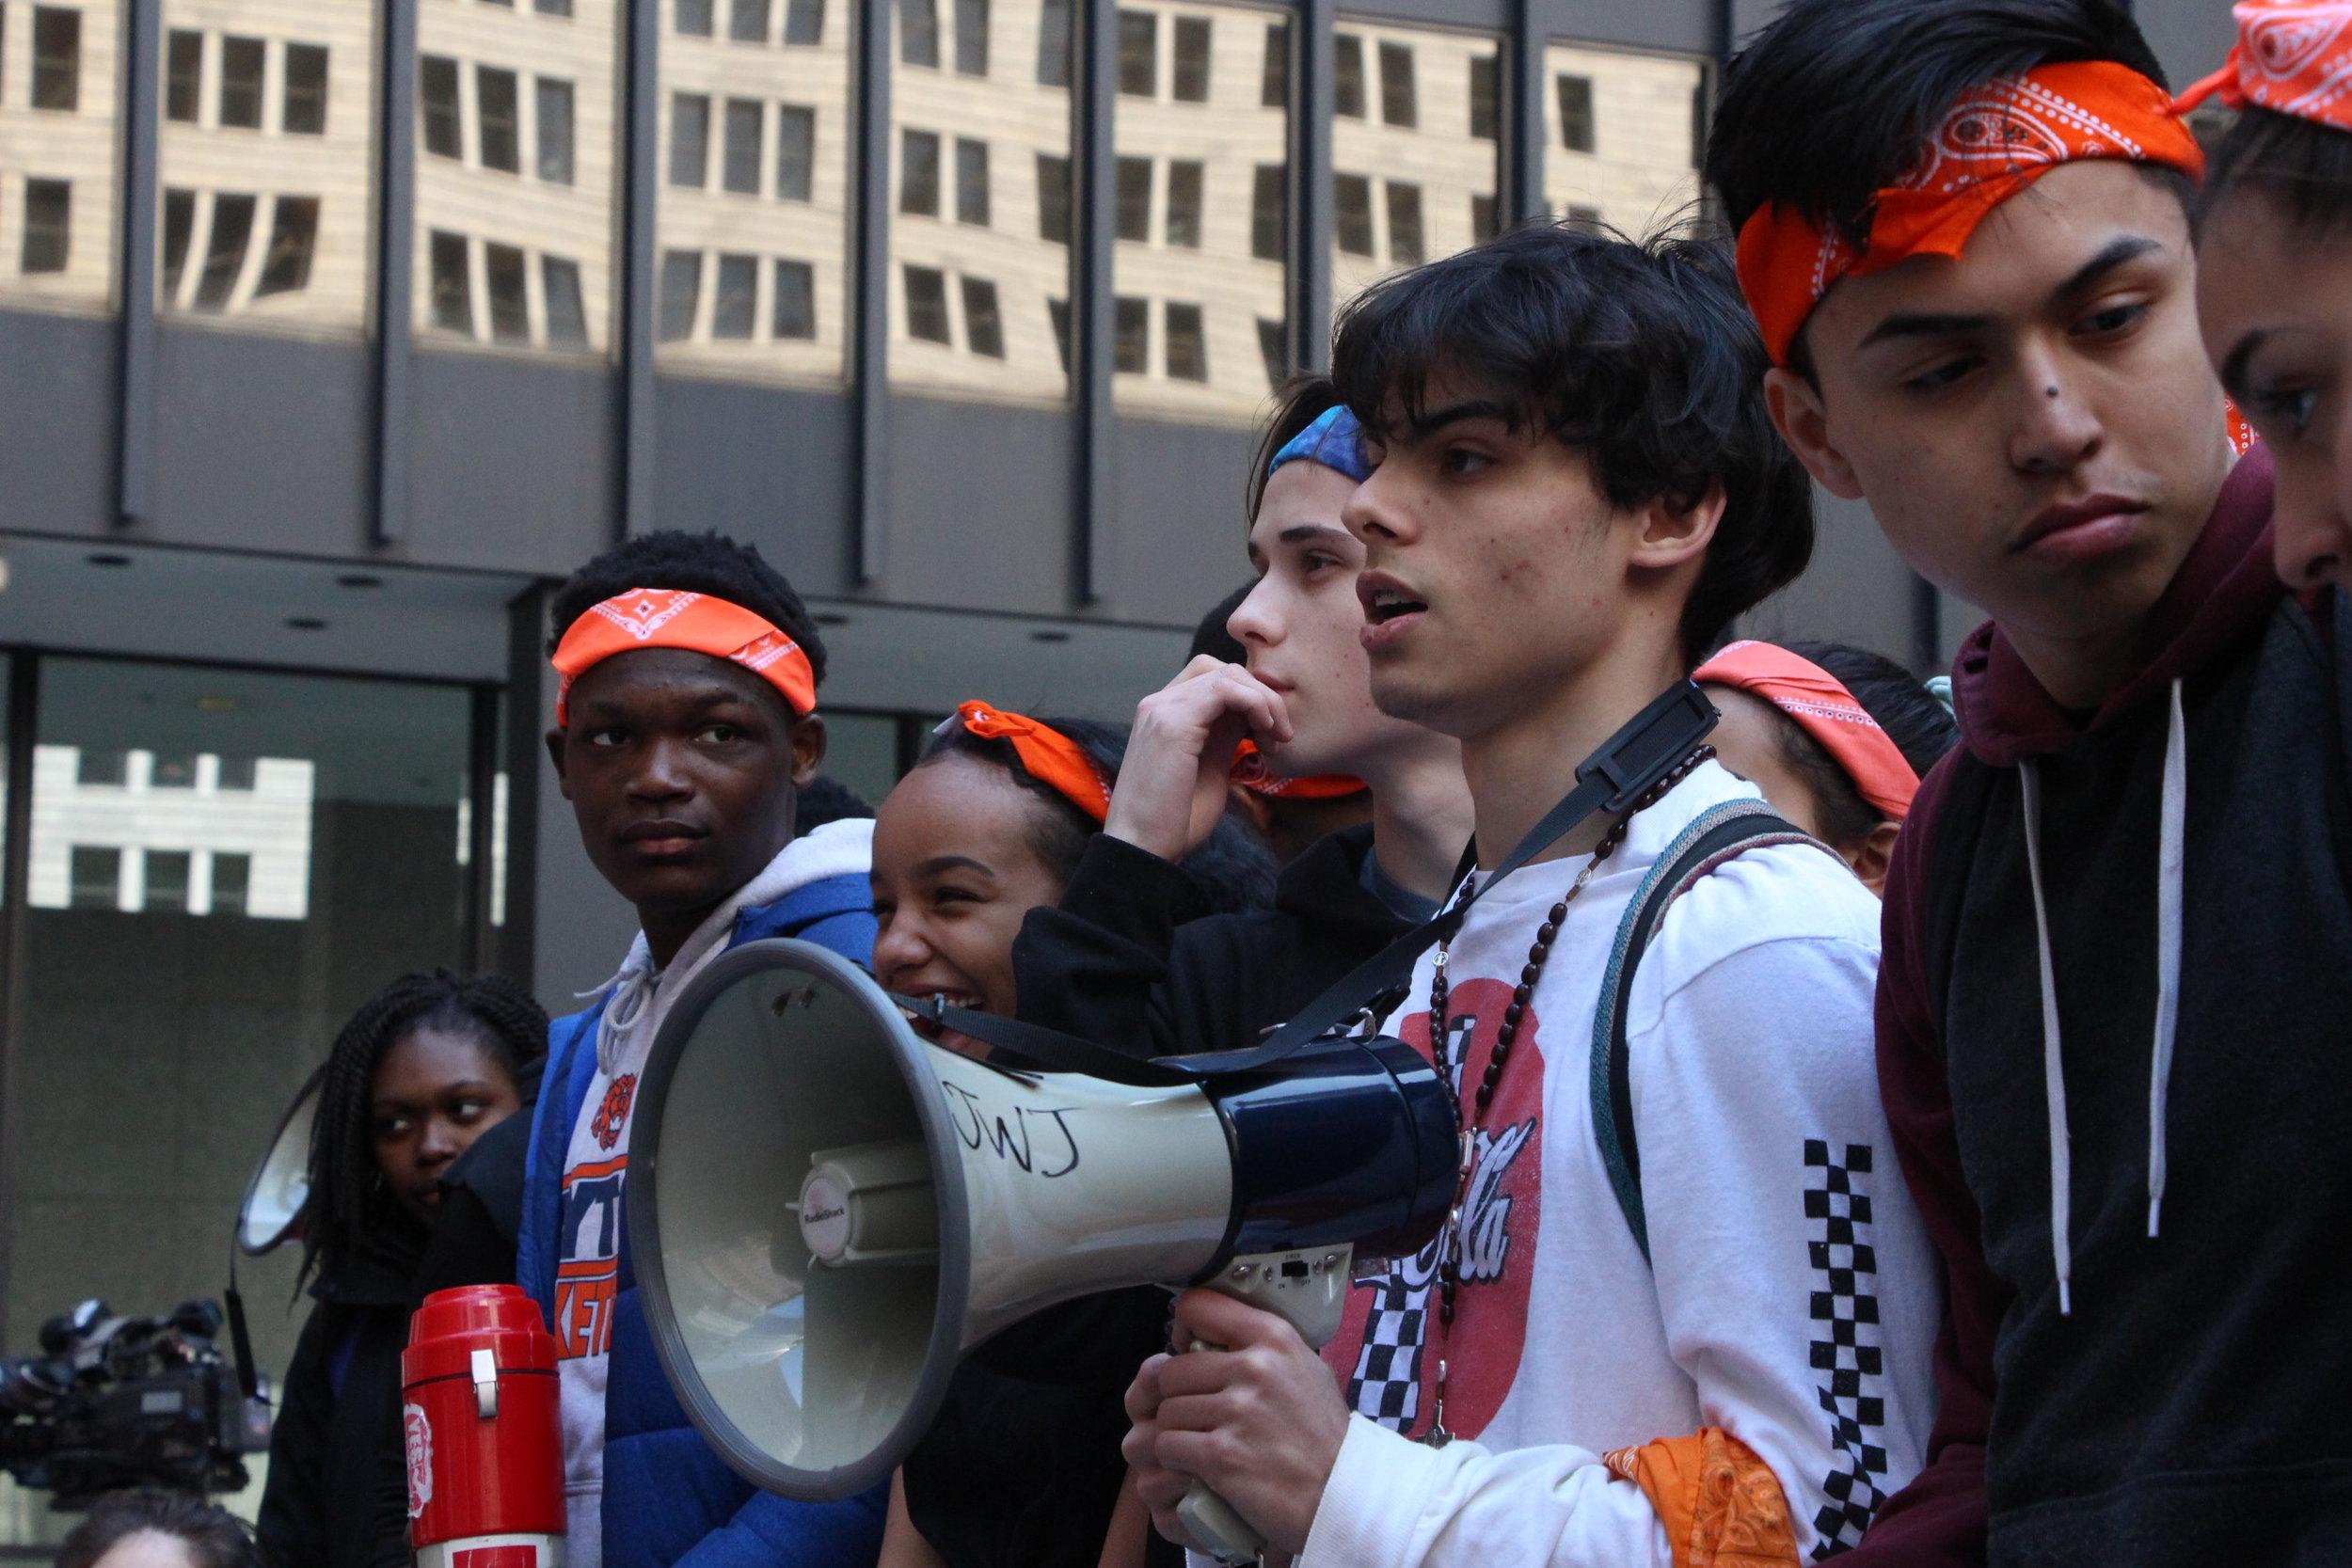 Other members of Chicago Student Walkout: Richard Alvarez (Walter Payton College Prep) , Gage Gerding, Esther O'Leary (Walter Payton College Prep), and Grace Conrad.